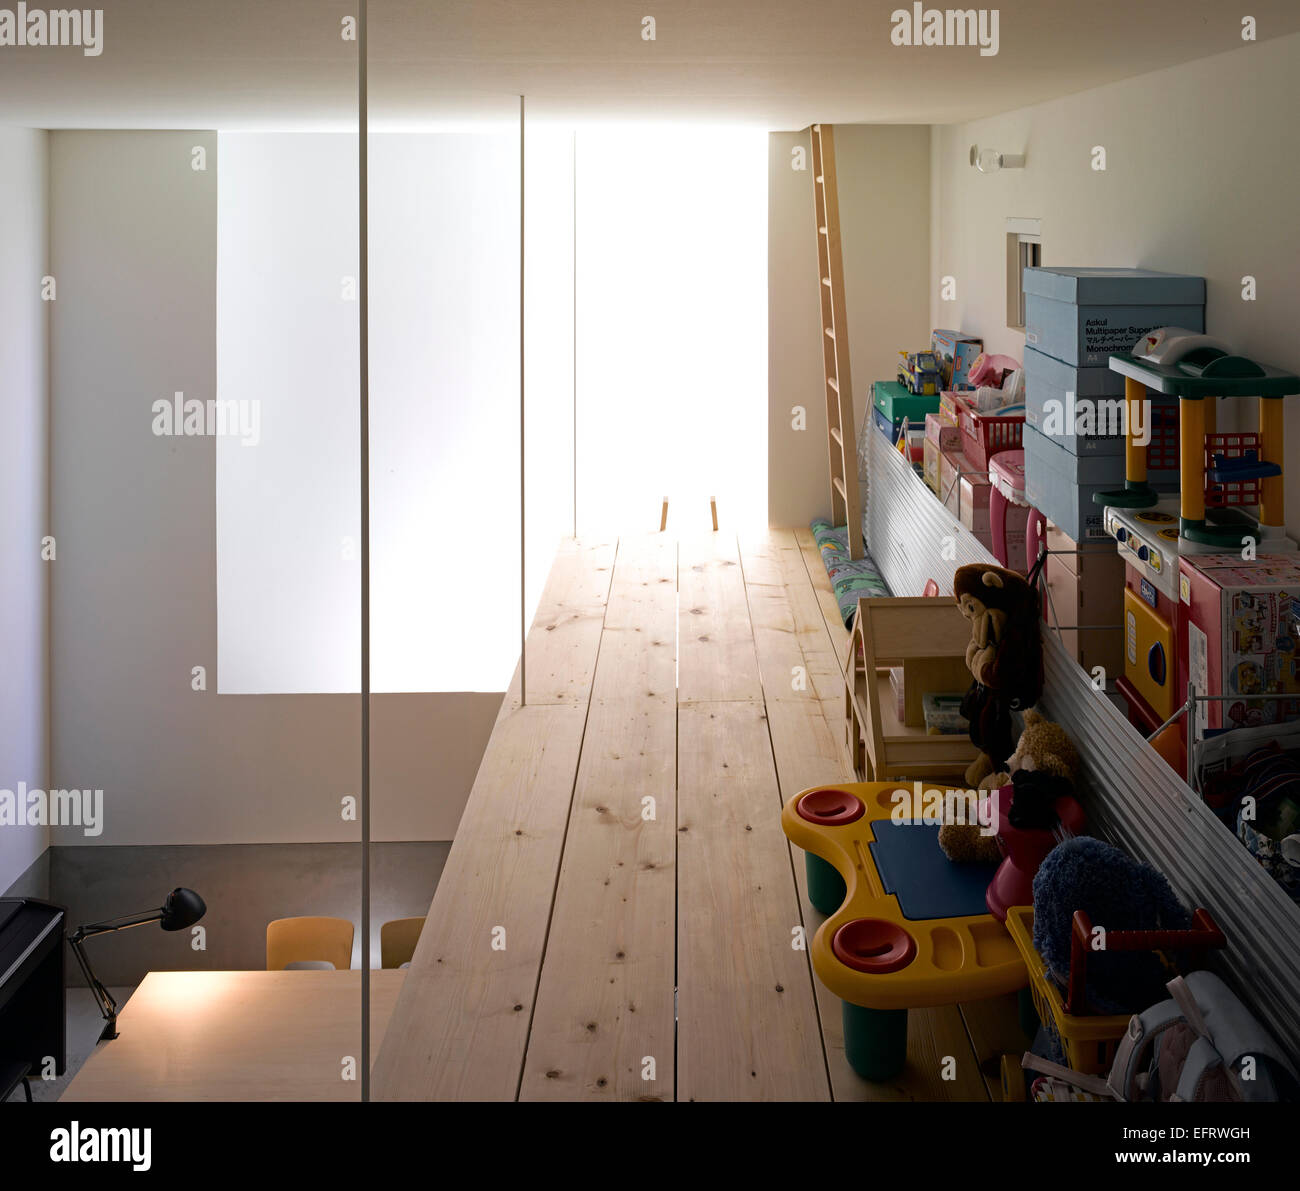 Mezzanine Area hokkaido house, interior view showing childrens' mezzanine play